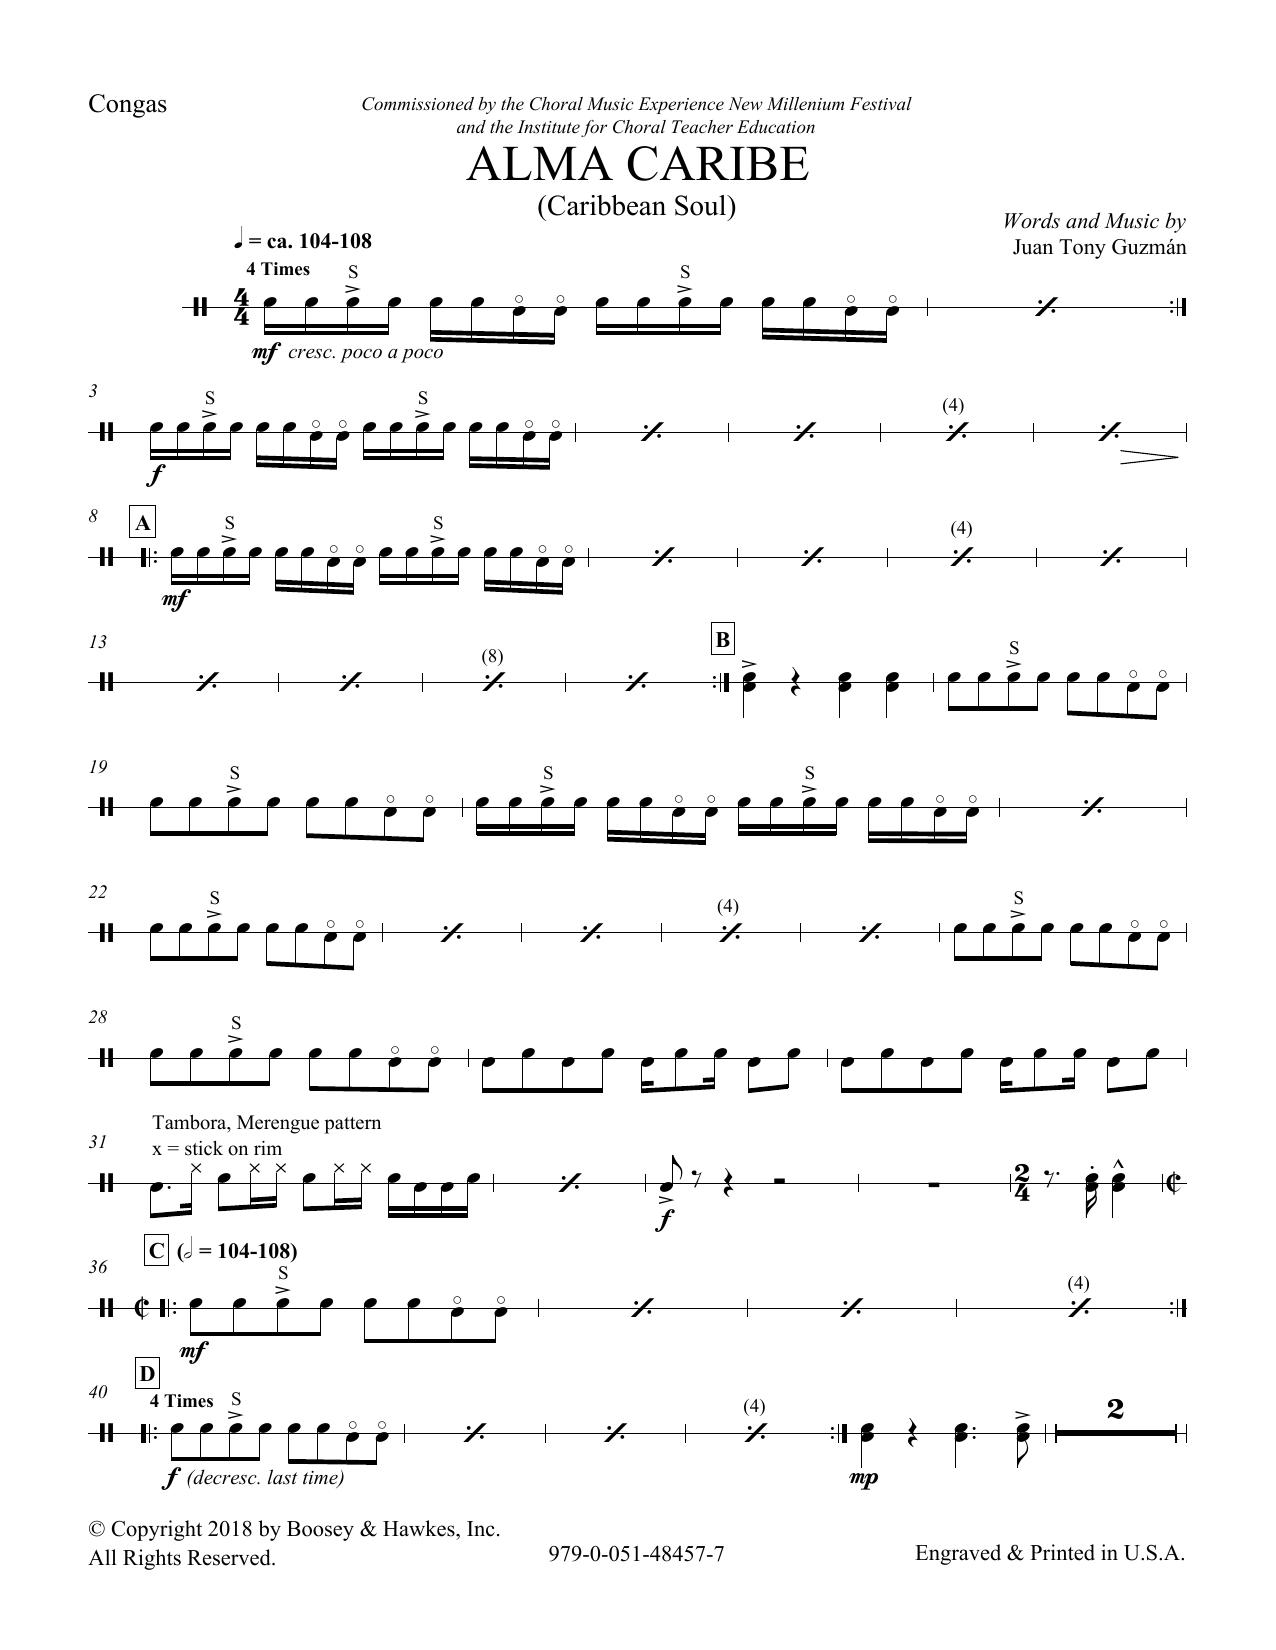 Download Juan Tony Guzman 'Alma Caribe (Caribbean Soul) - Congas' Digital Sheet Music Notes & Chords and start playing in minutes